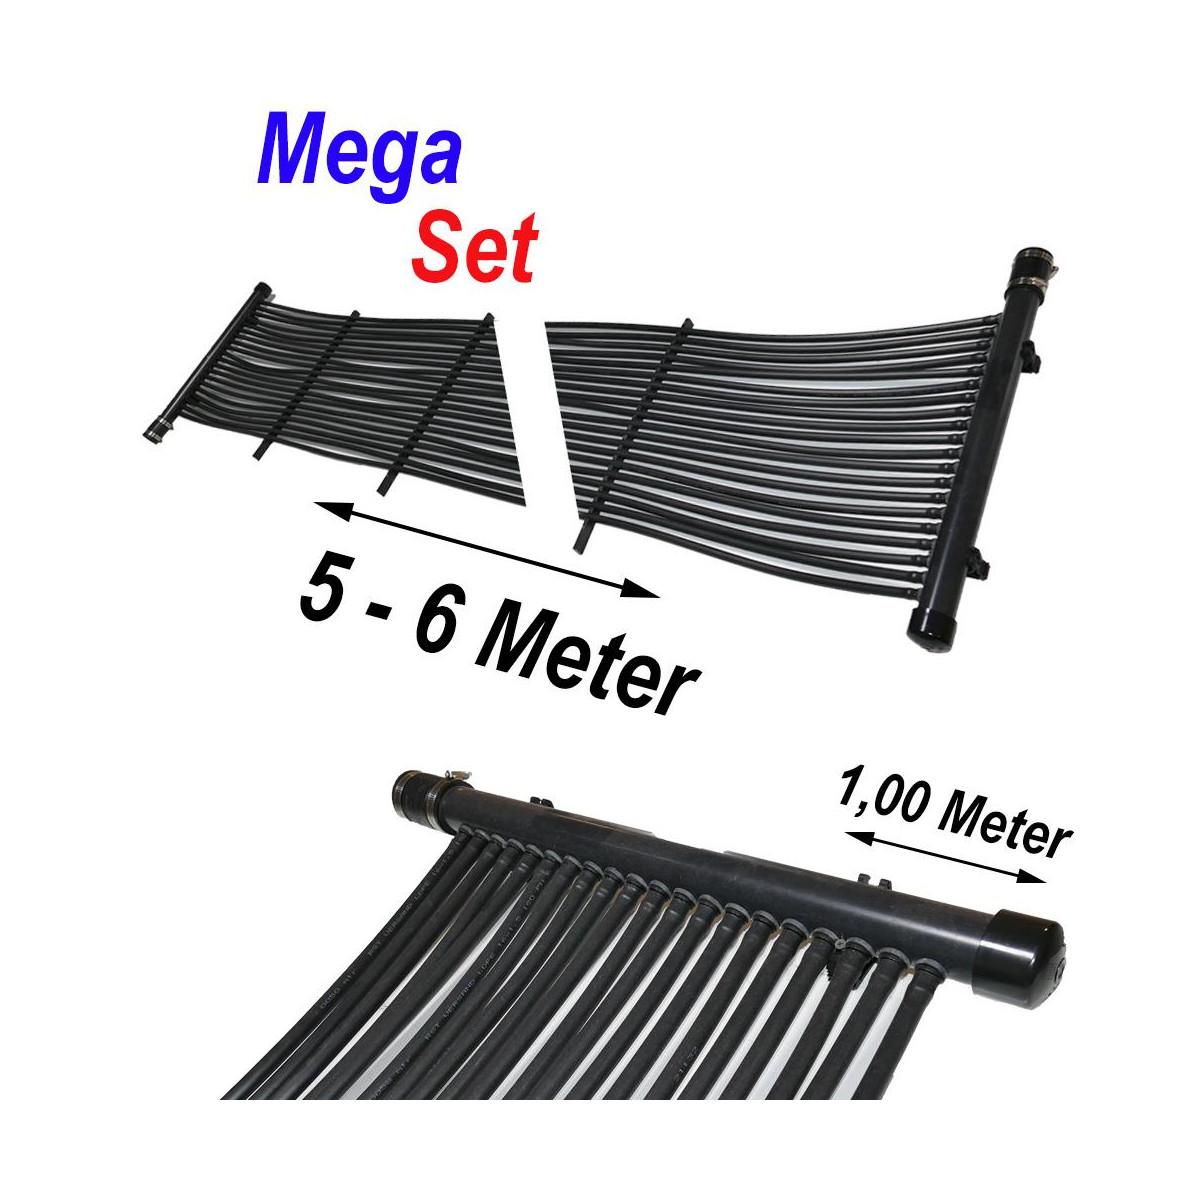 RST-VERSAND (Eigenmarke) Poolheizung Solarmatte MegaSet 5,40 m² (180 Meter)